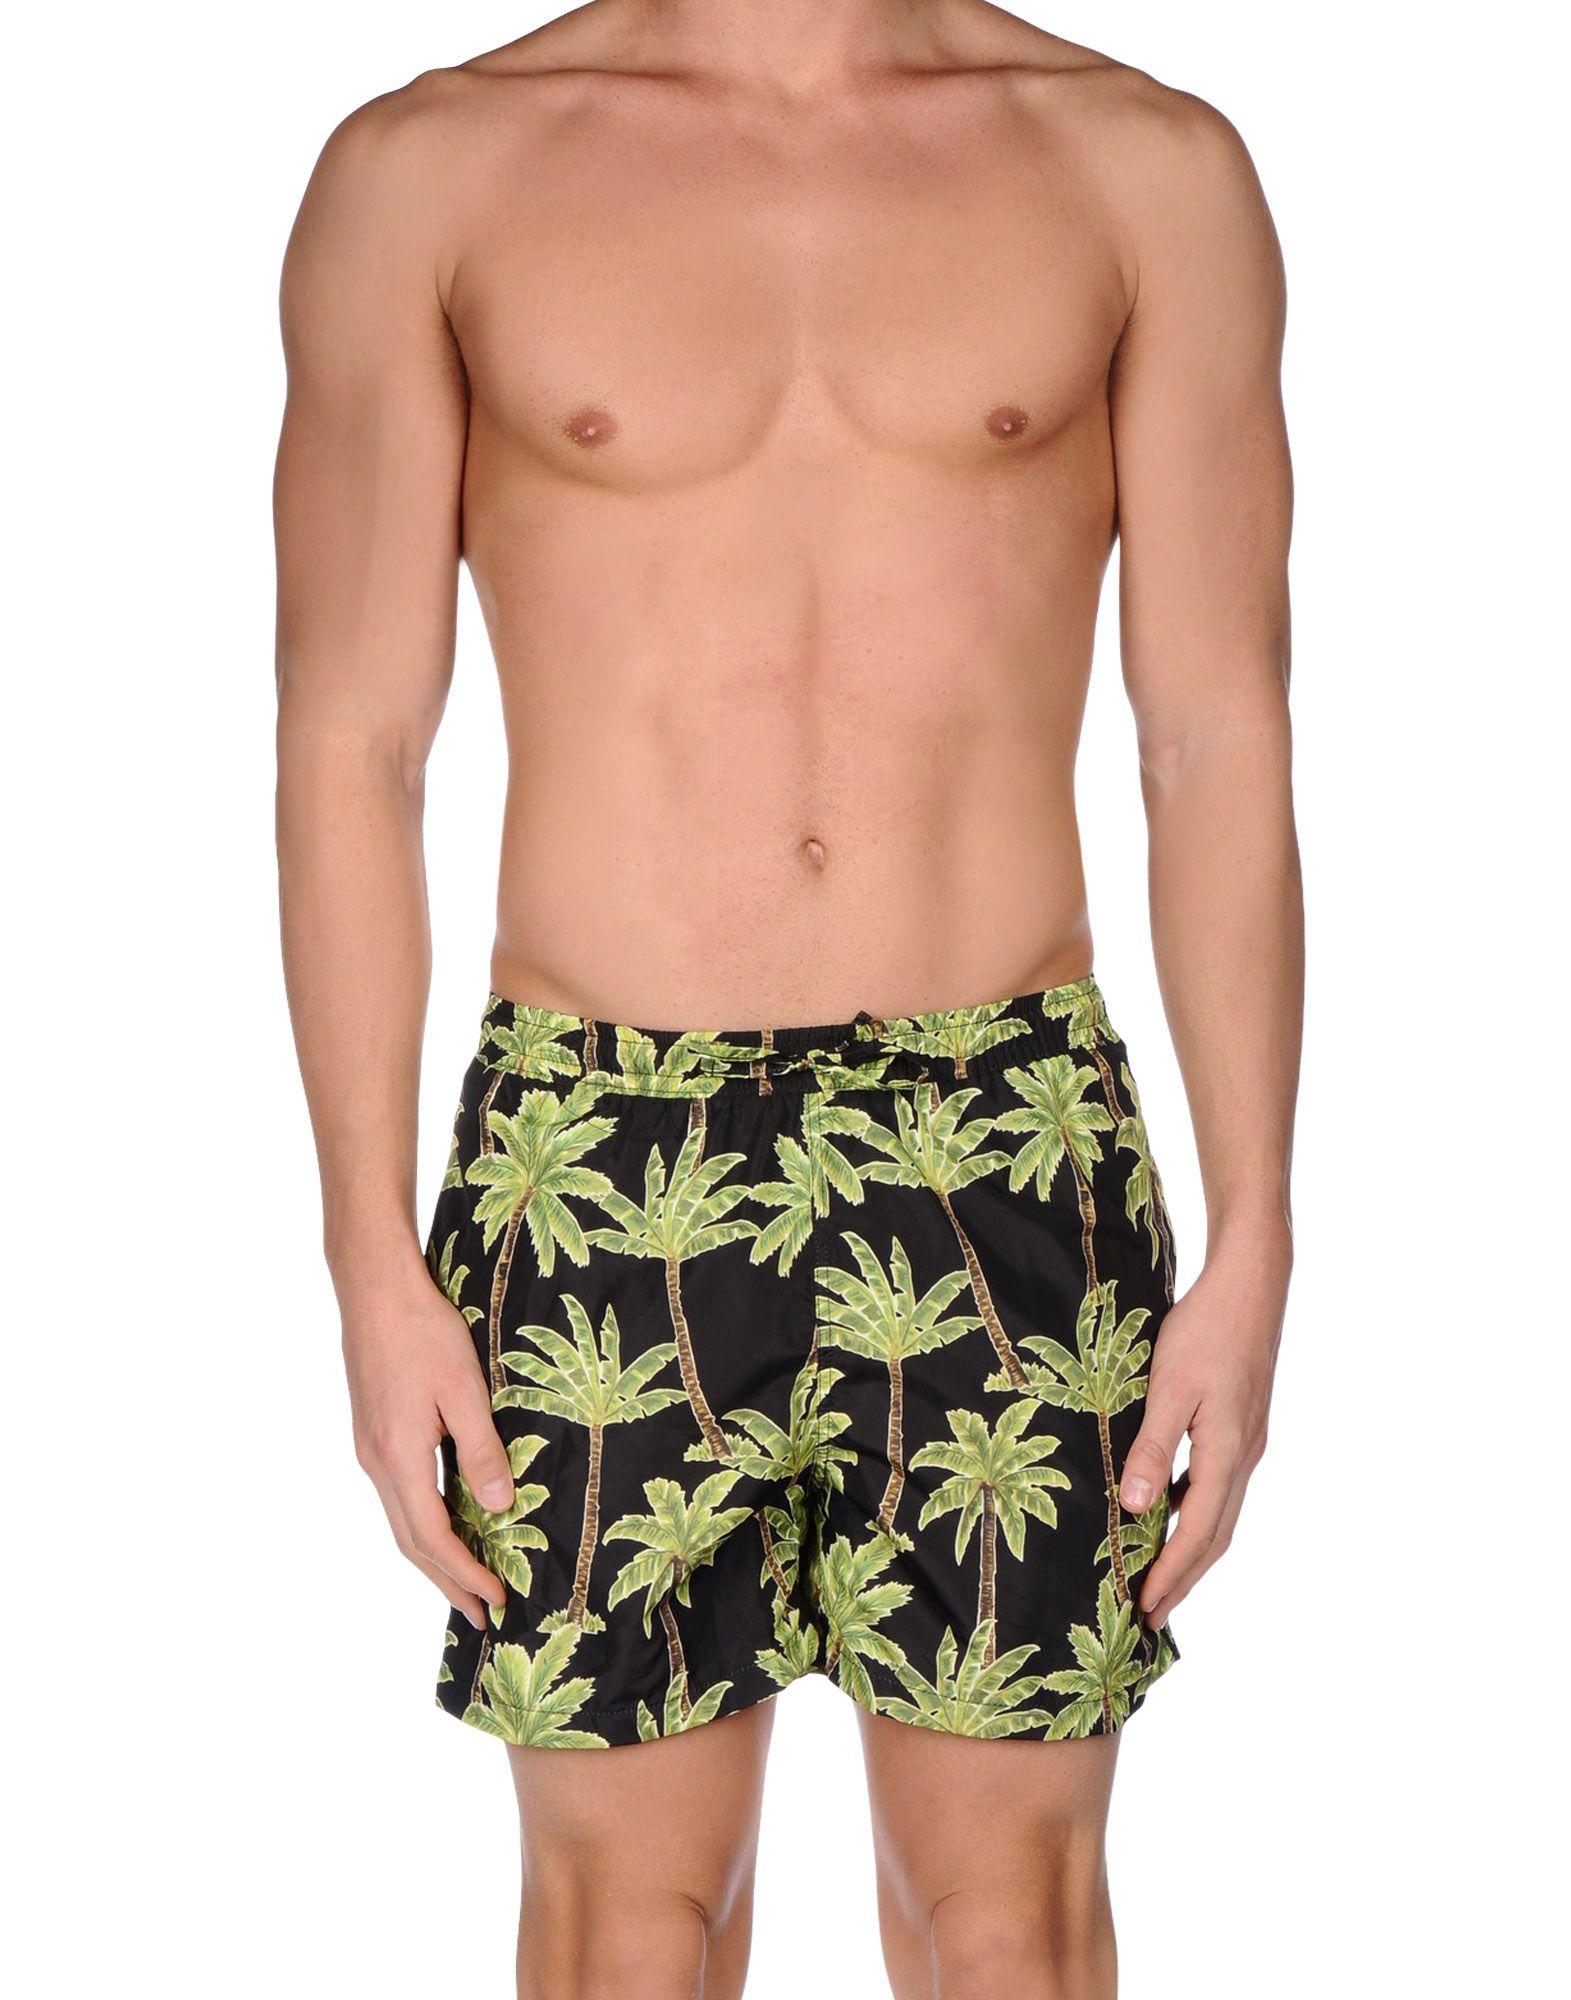 BIKINI LOVERS Шорты для плавания sexy bikini women swimsuit swimwear bikini set biquini bandage bathing suit beachwear push up maillot de bain femme swim suit